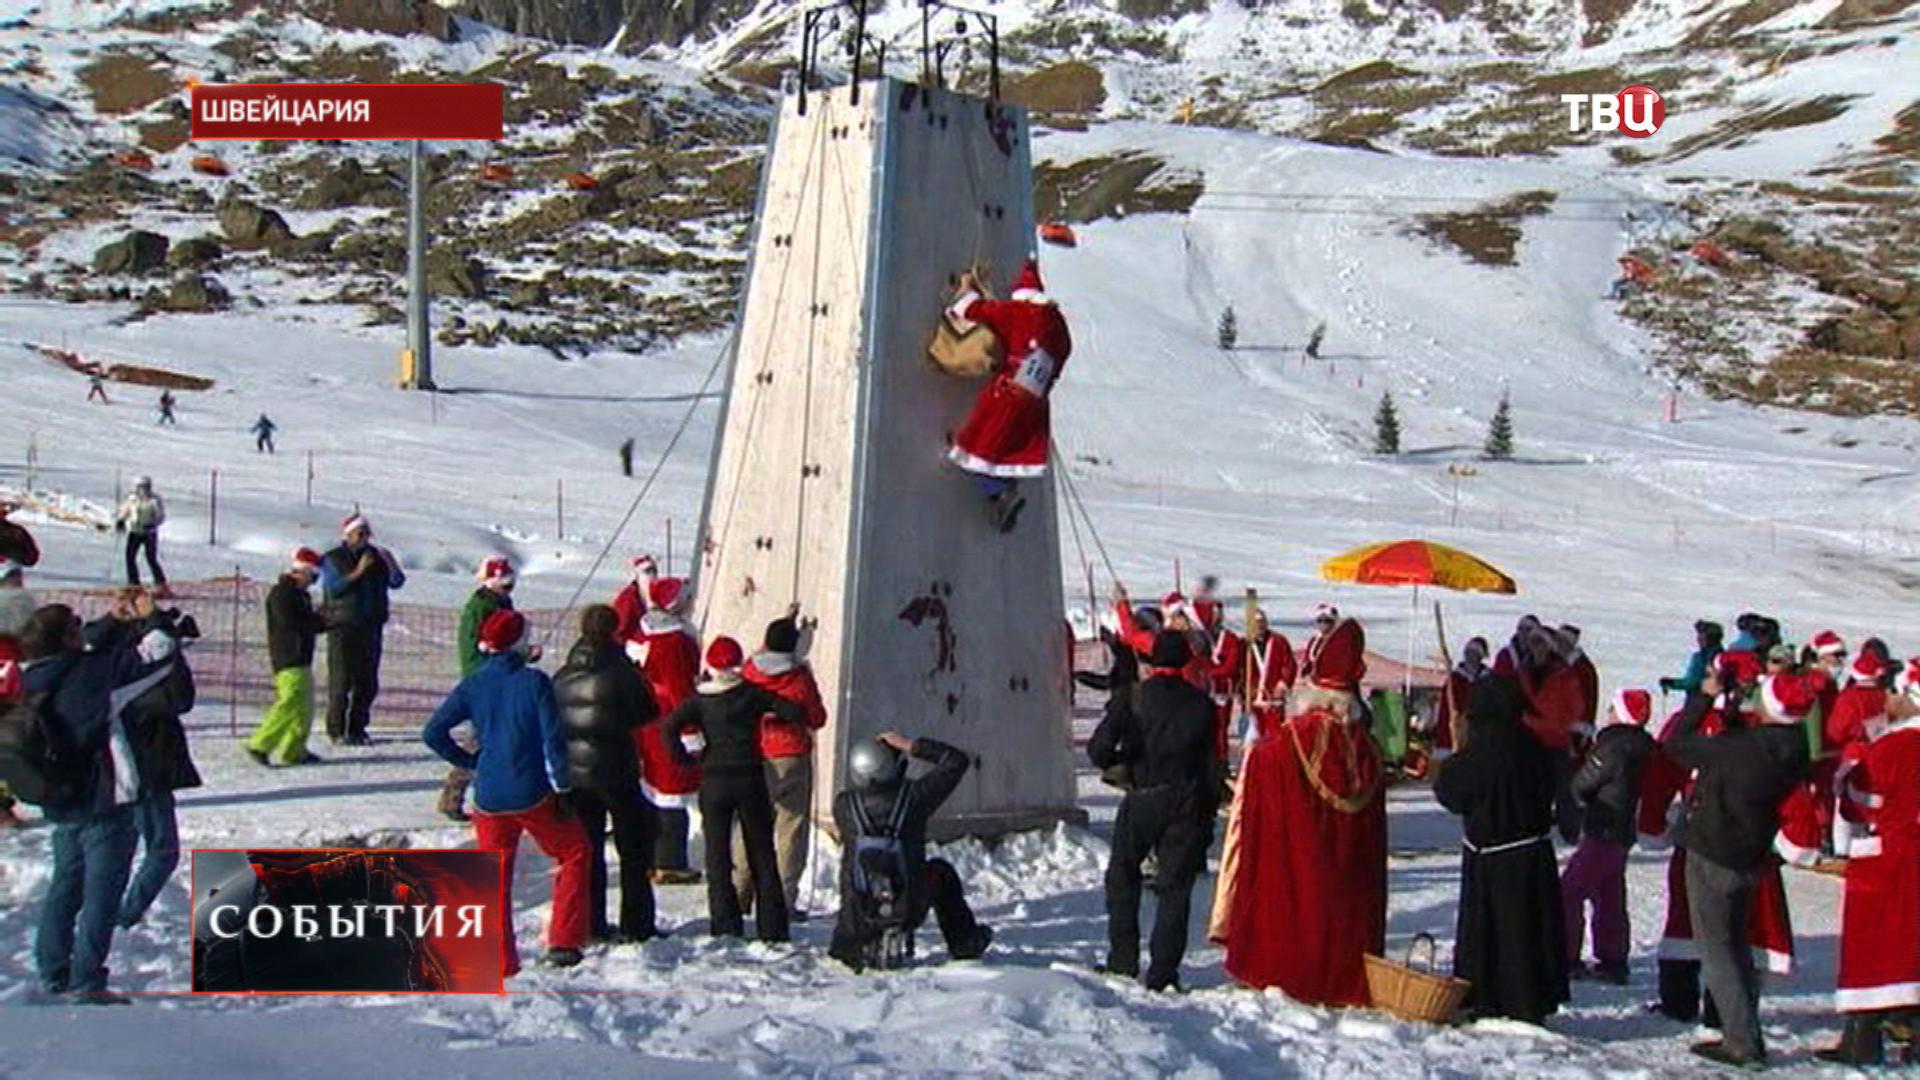 Чемпионат Санта-Клаусов в Швейцарии